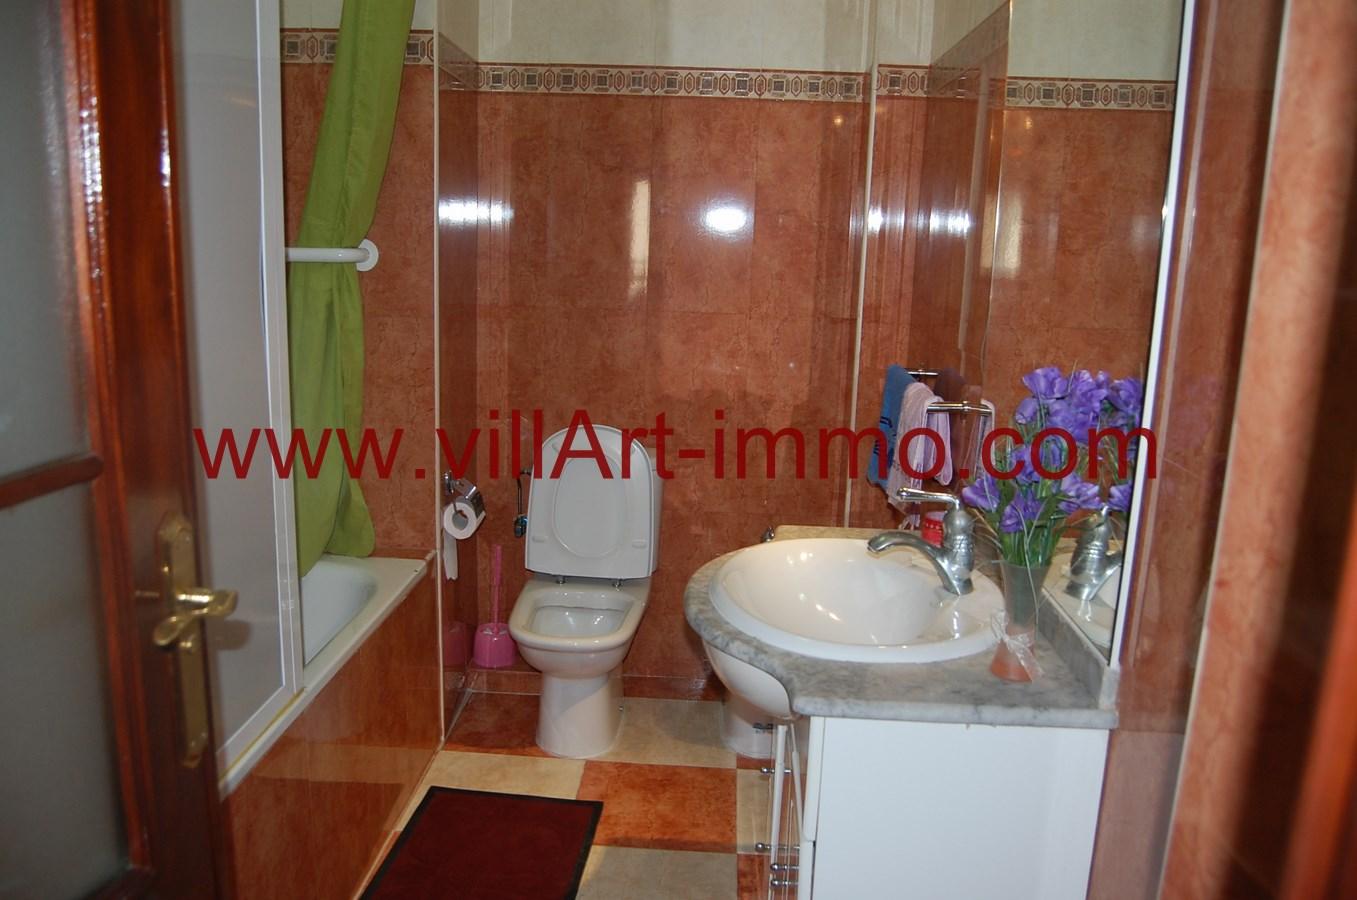 14-location-appartement-meuble-iberia-tanger-salle-de-bain-l895-villart-immo